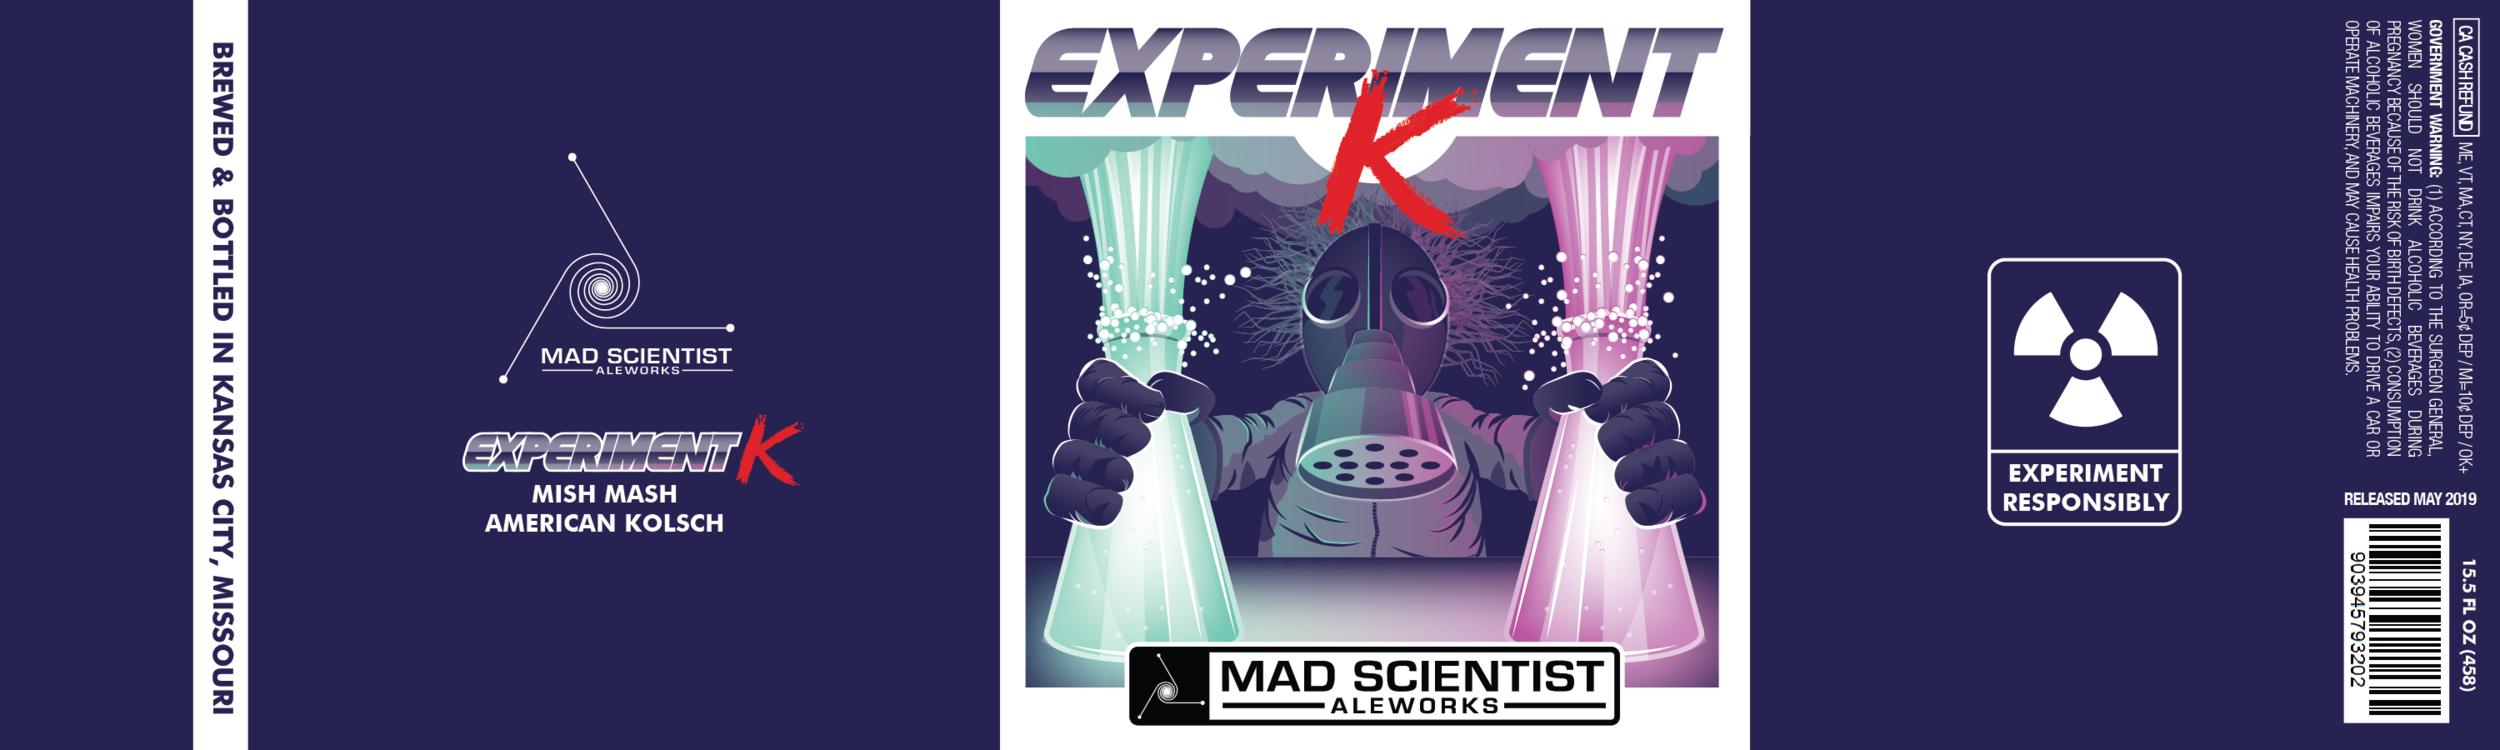 Experiment-K-Bottle-01-01.png